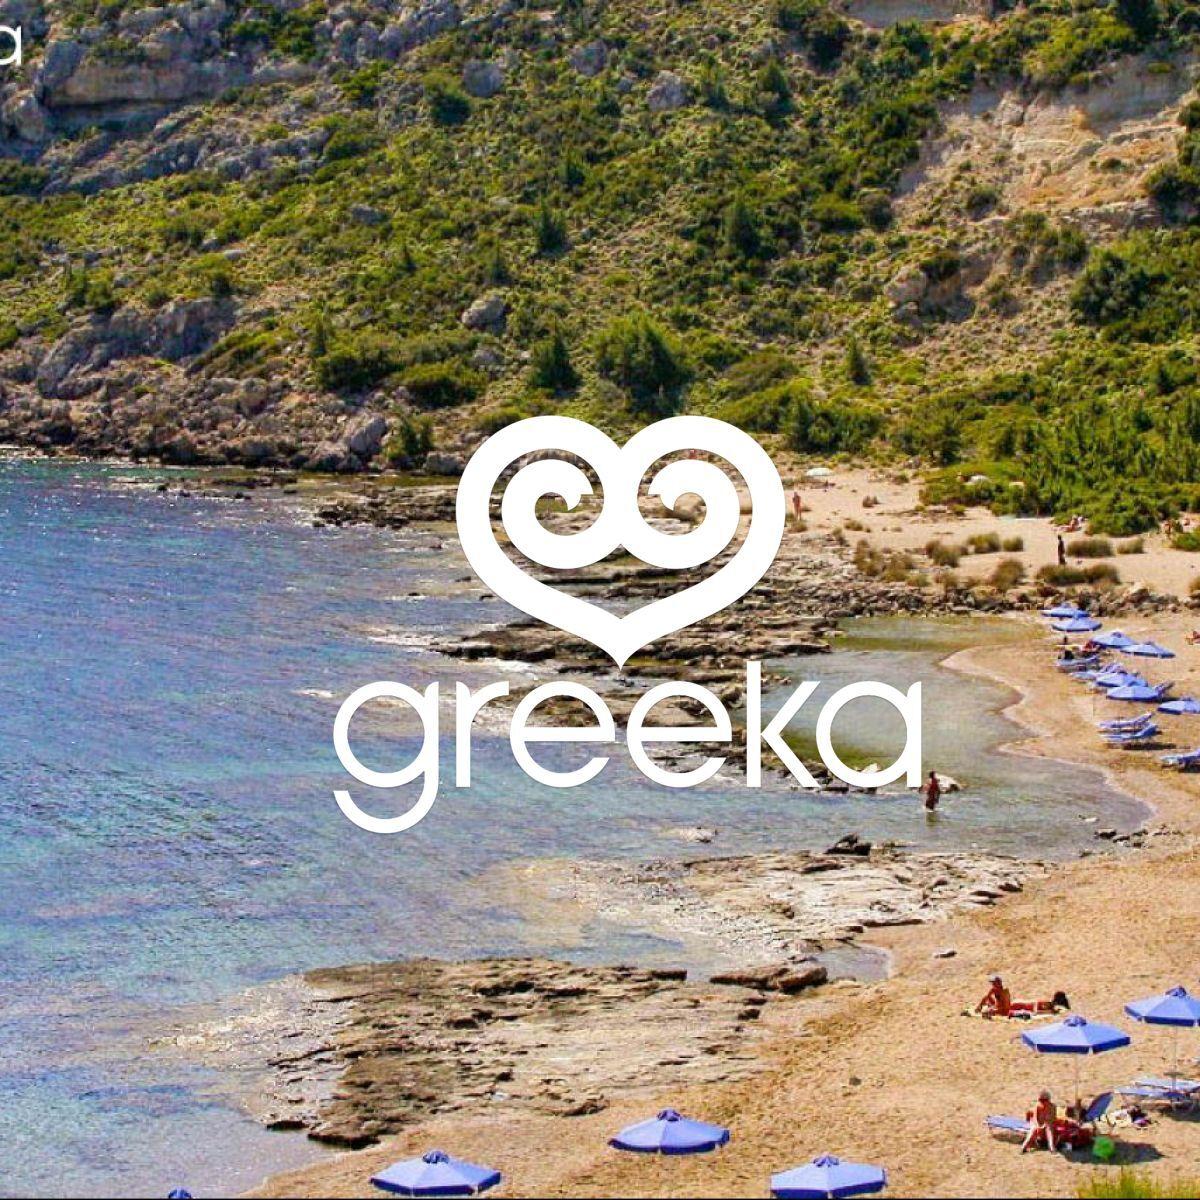 taverna op het strand - Picture of Faliraki Nudist Beach